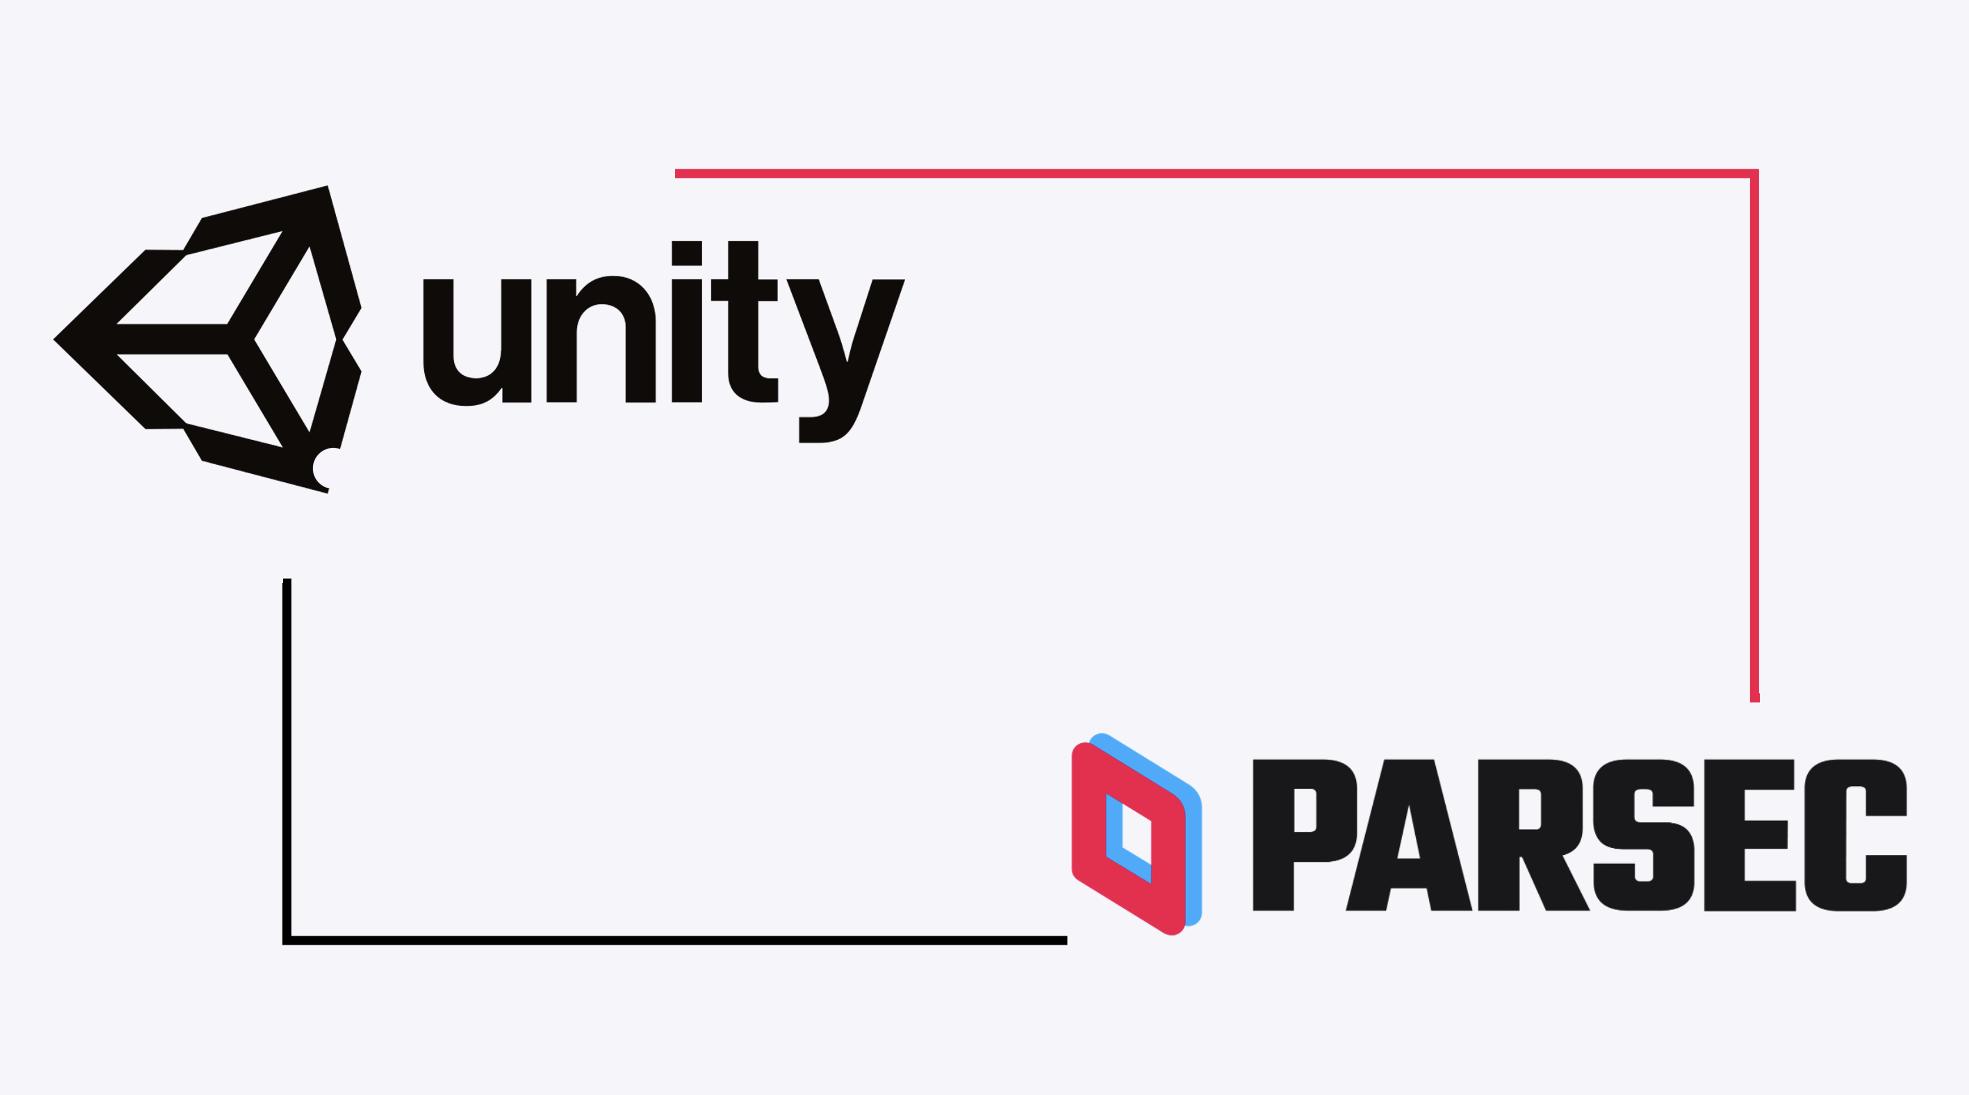 Unity Parsec